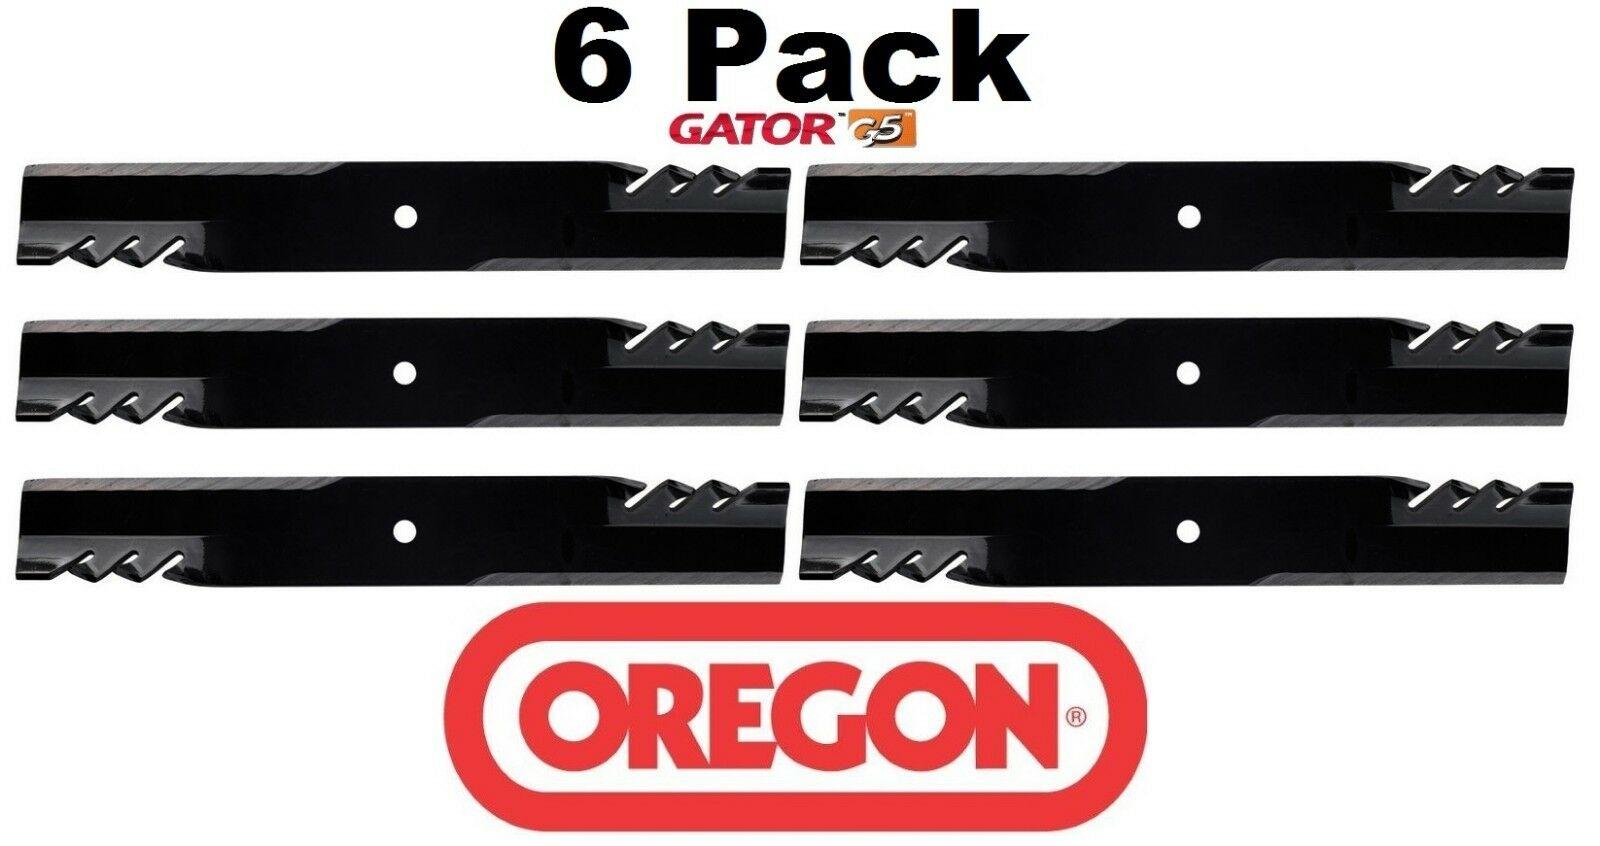 4 Pack Oregon 596-344 Mower Blade Gator G5 Fits Dixon 10715